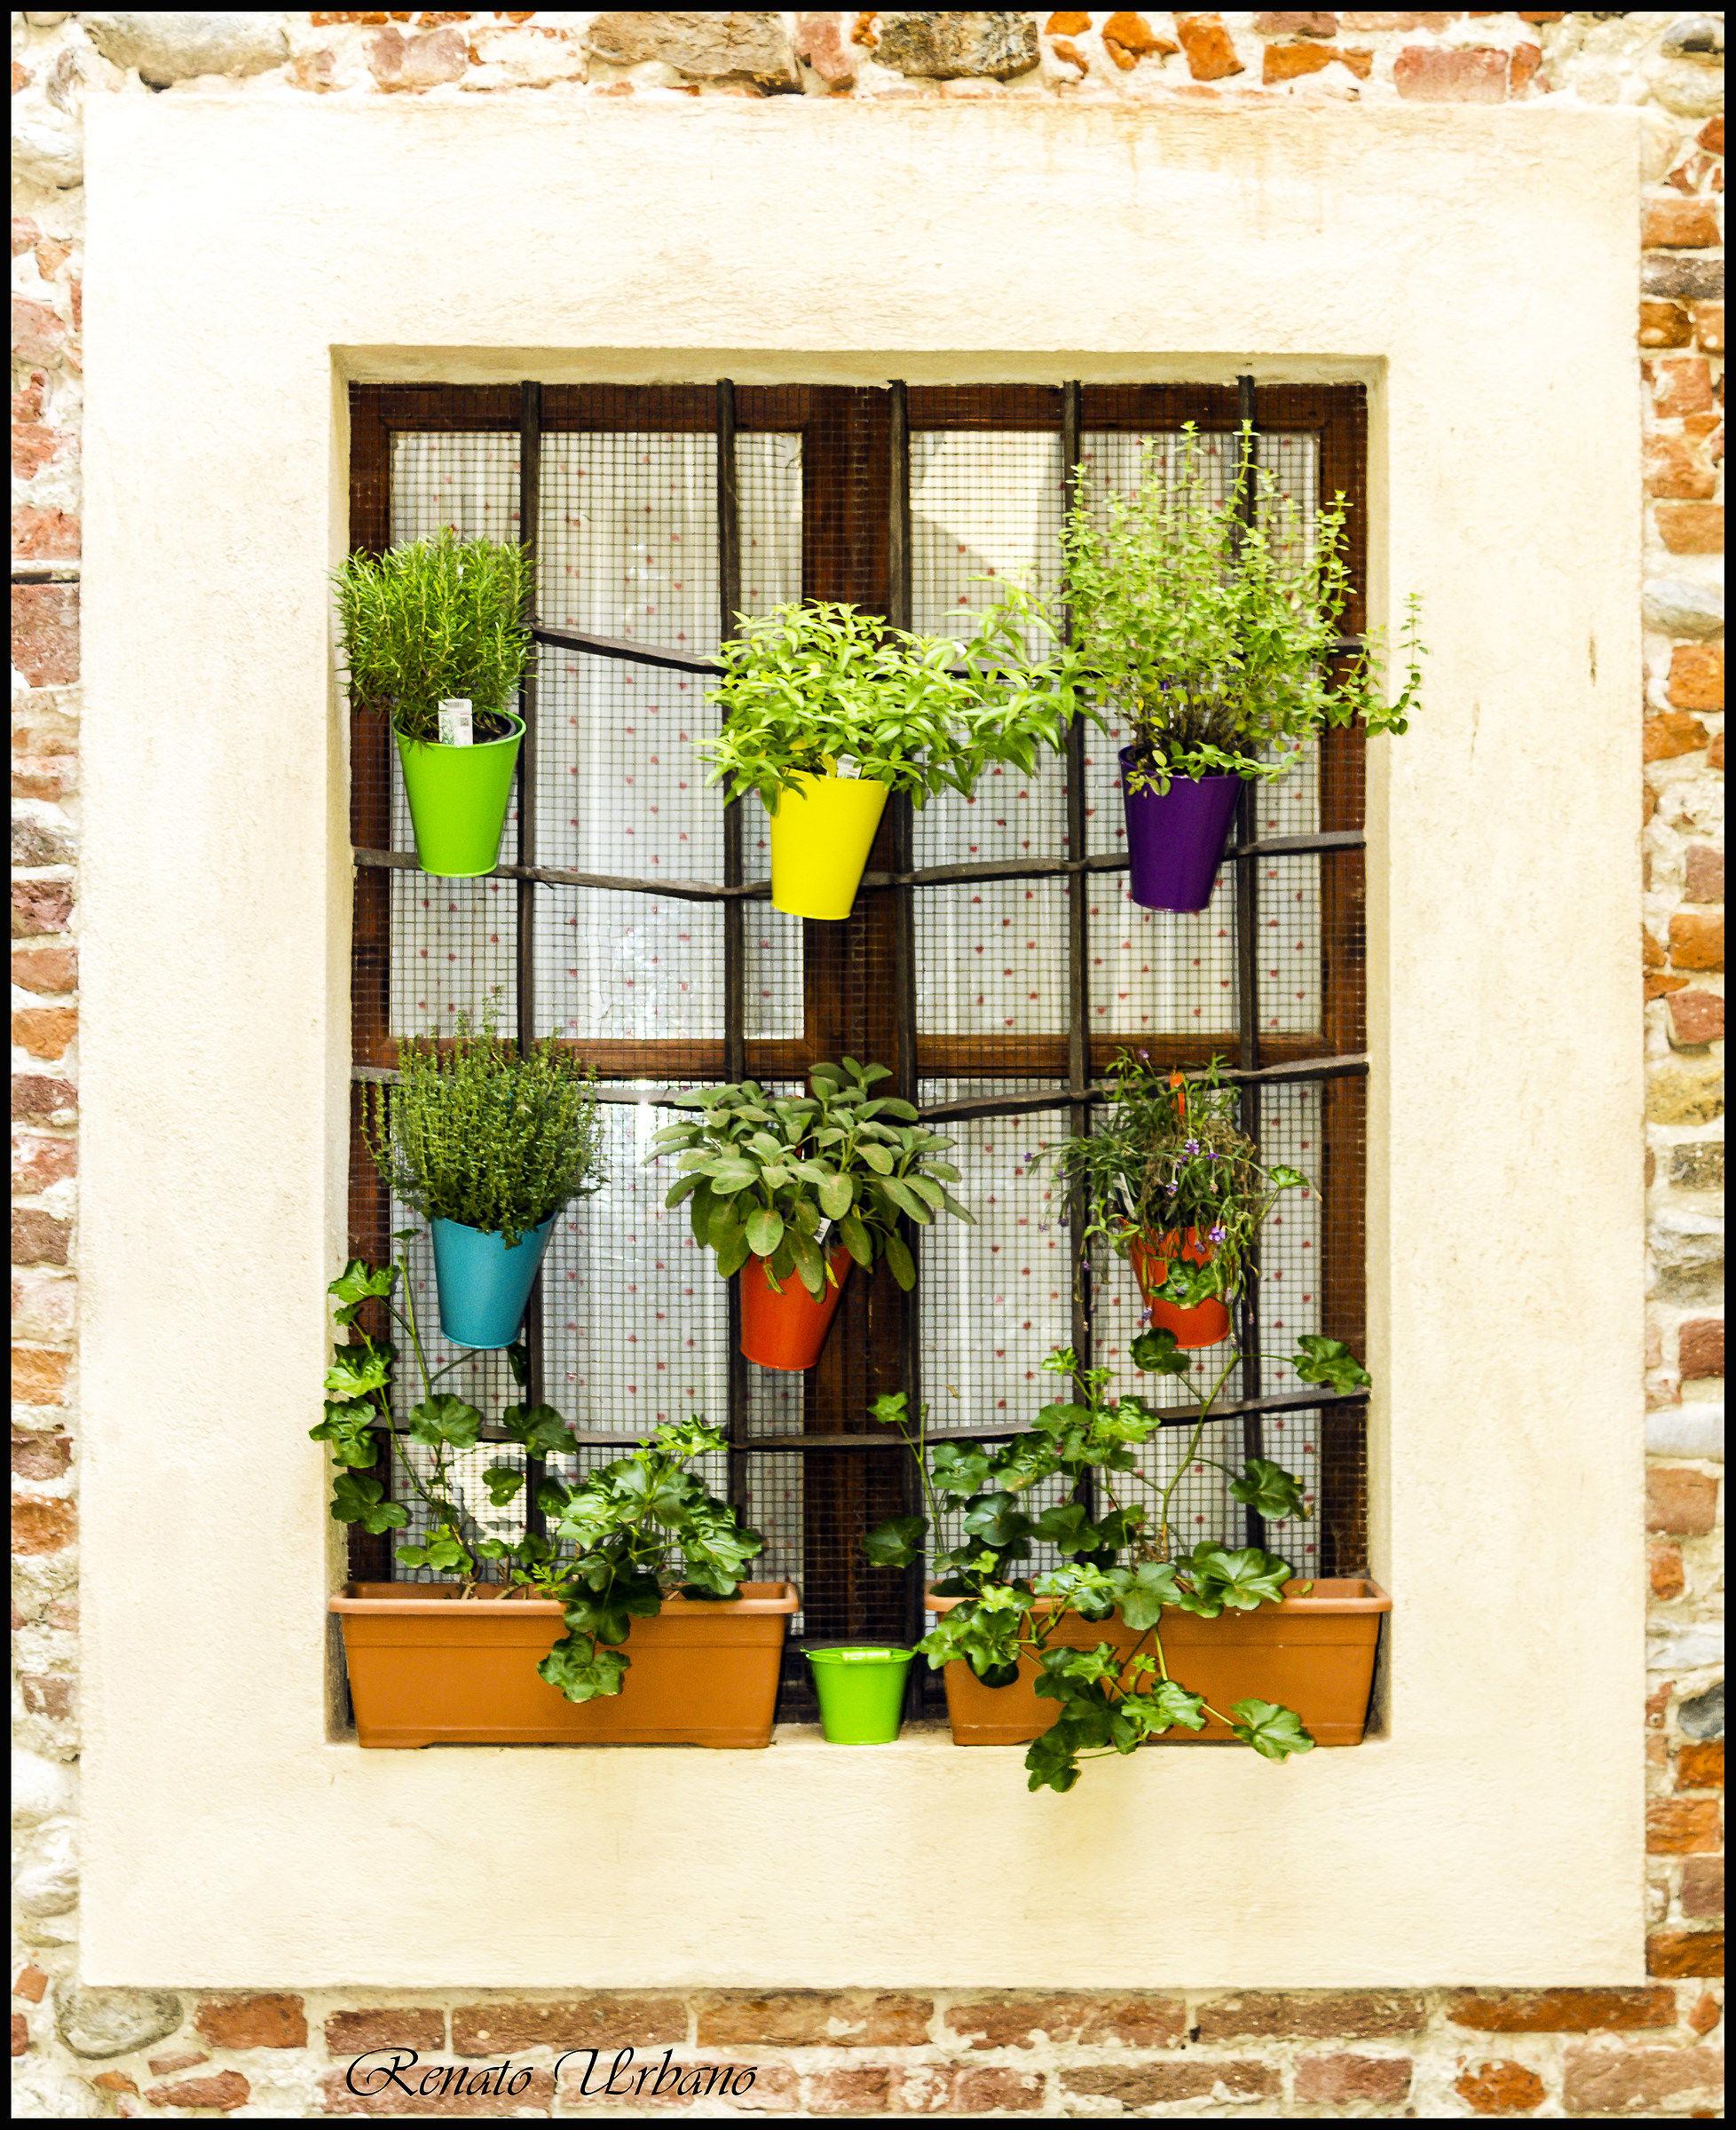 Una finestra per giardino juzaphoto - Portavasi da finestra ...